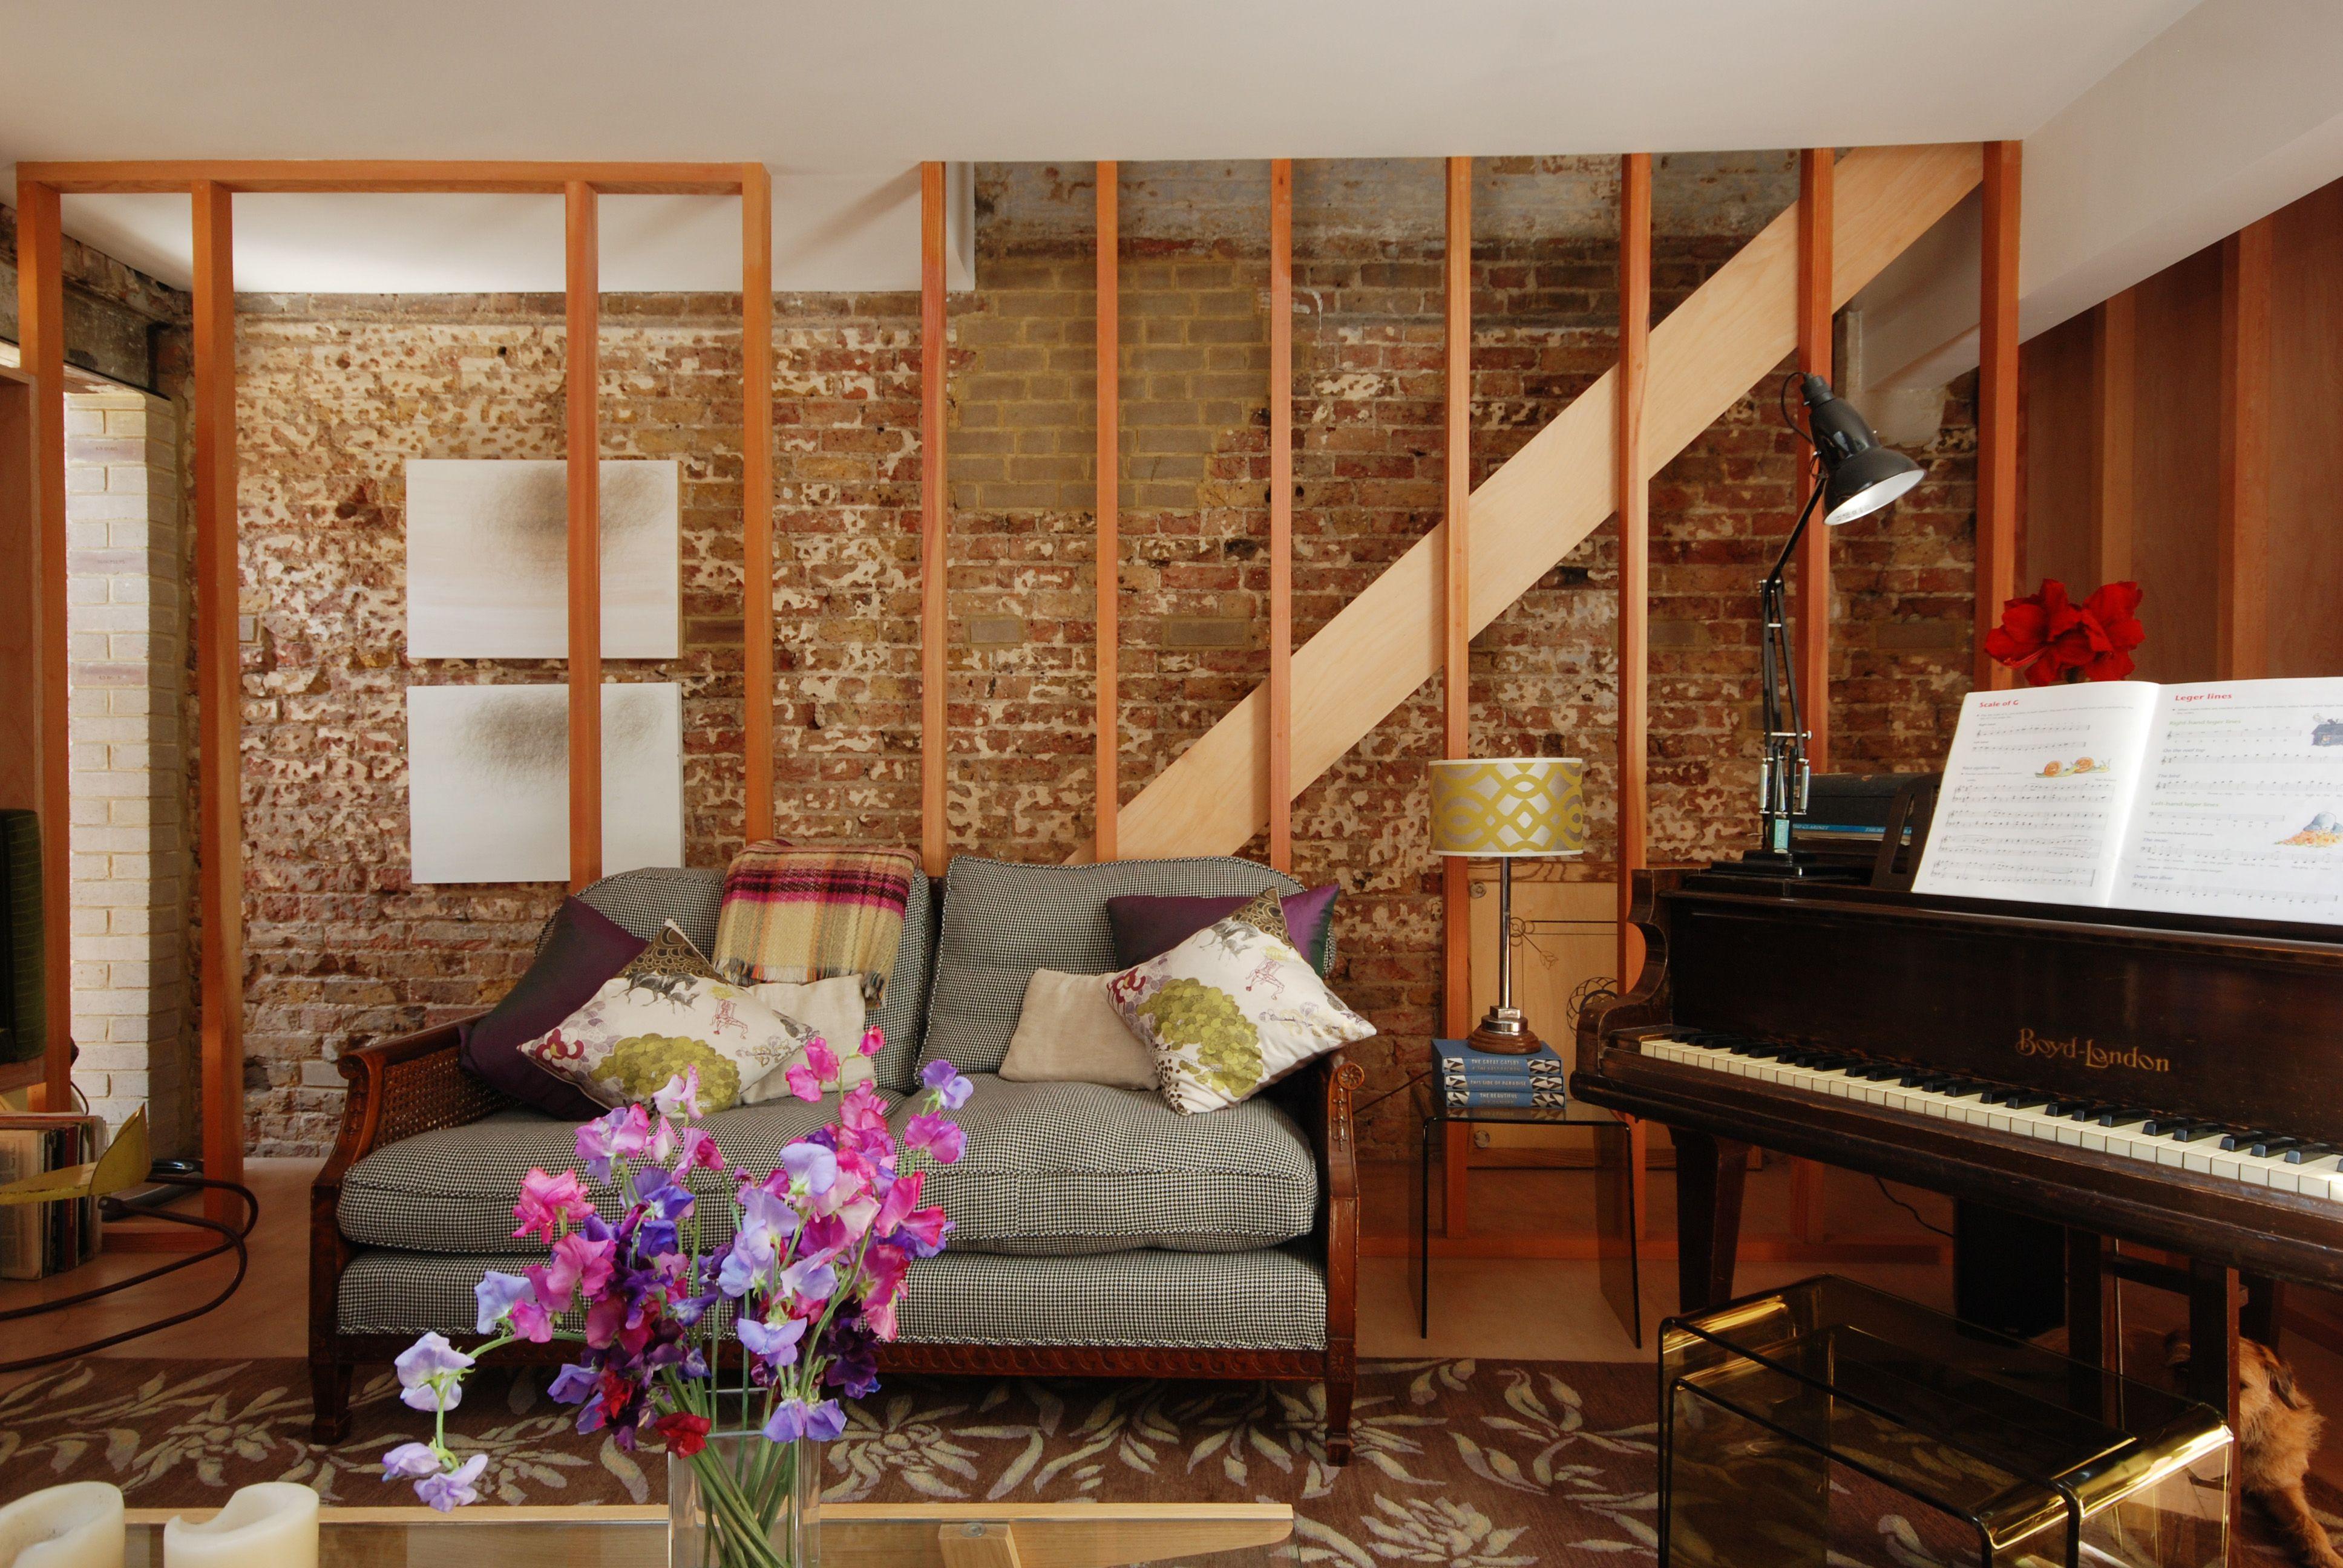 Collage House - Jonathan Tuckey Design, West Kilburn, London, Uk